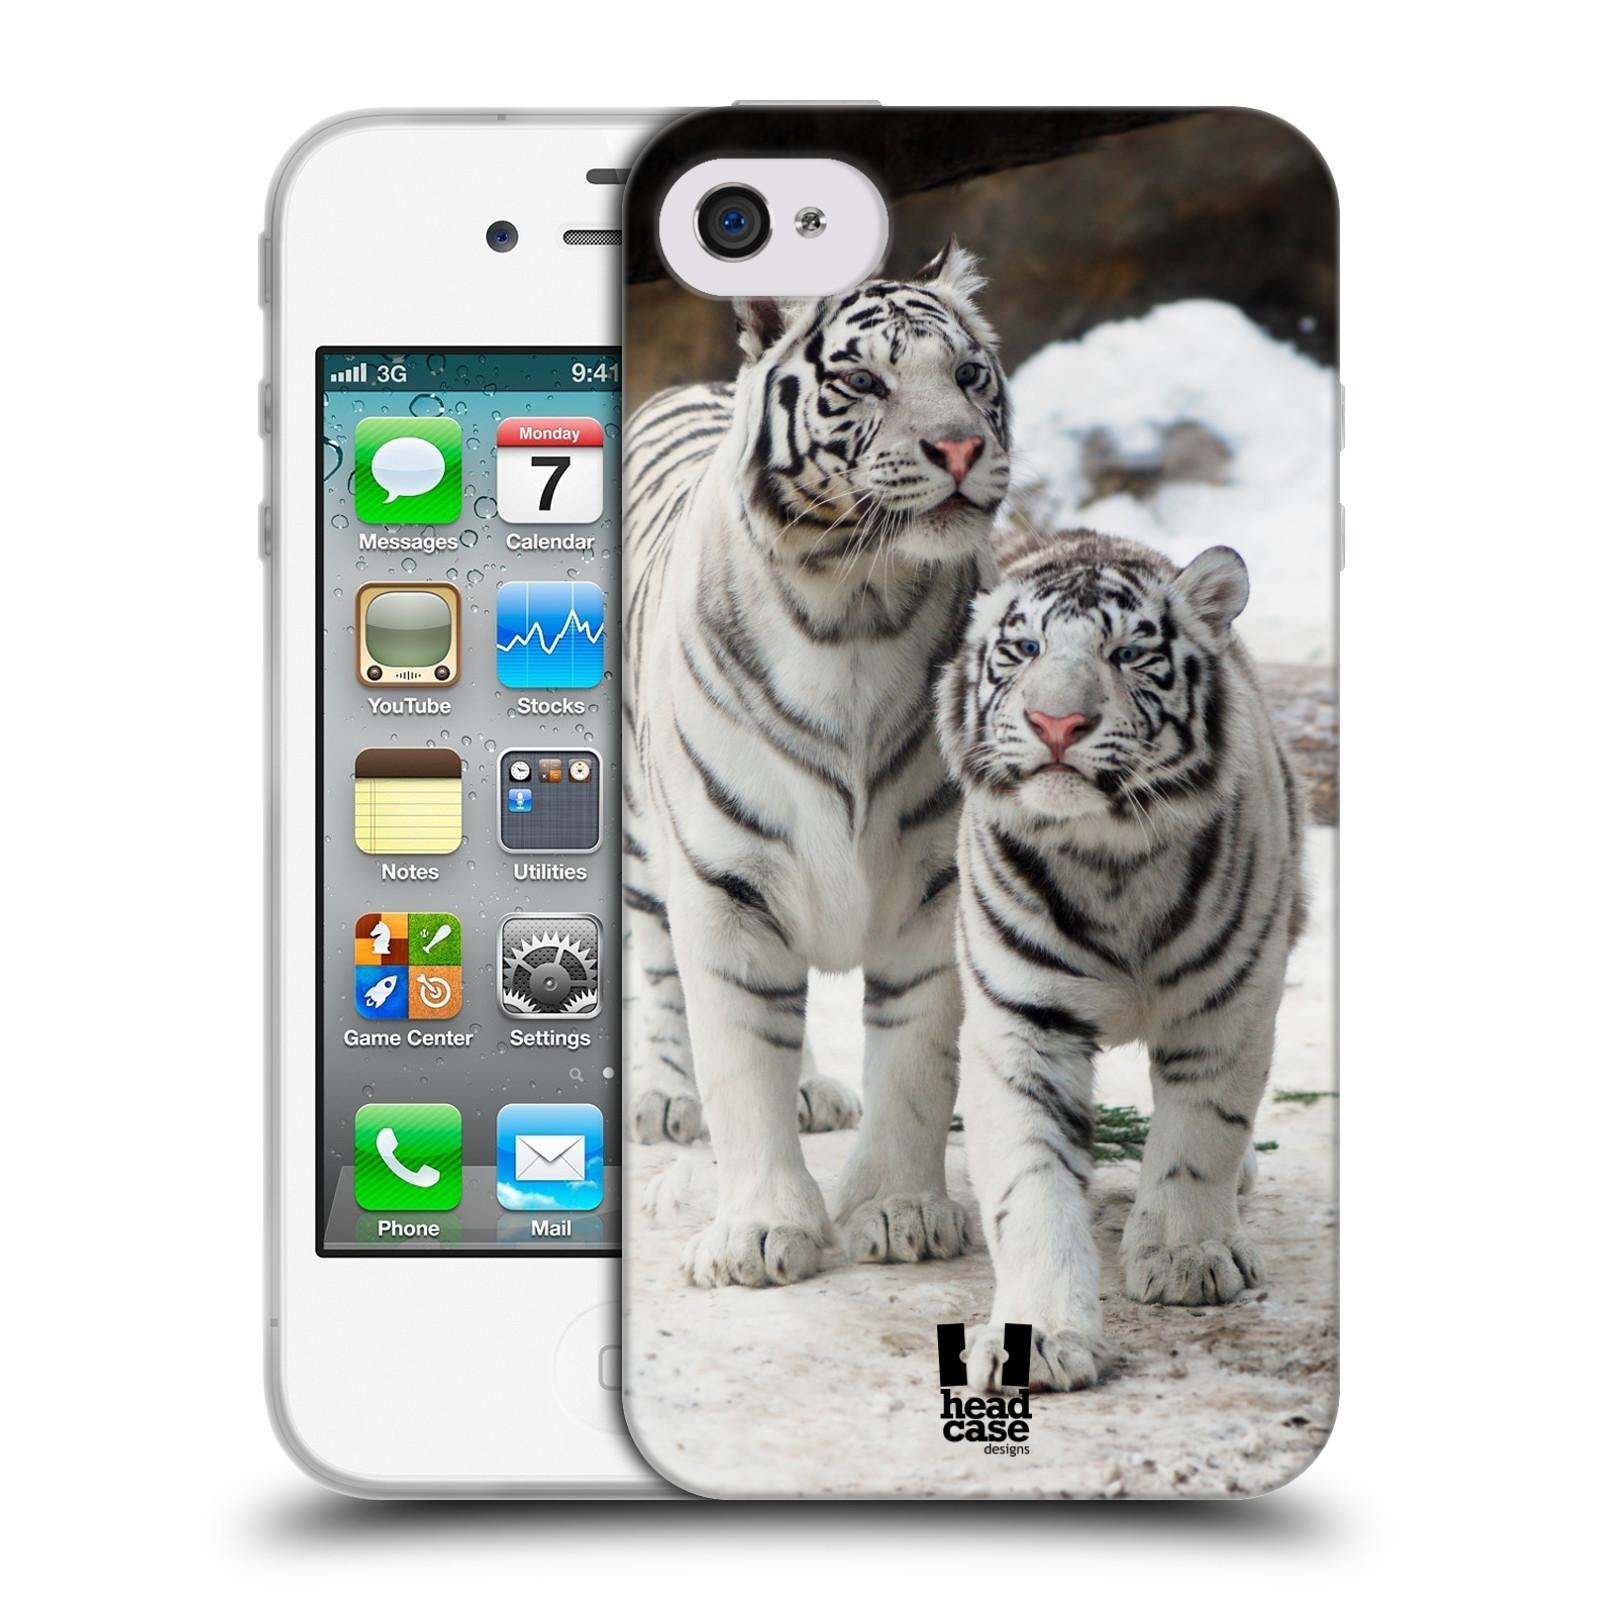 Silikonové pouzdro na mobil Apple iPhone 4 a 4S HEAD CASE BÍLÍ TYGŘI (Silikonový kryt či obal na mobilní telefon Apple iPhone 4 a 4S)